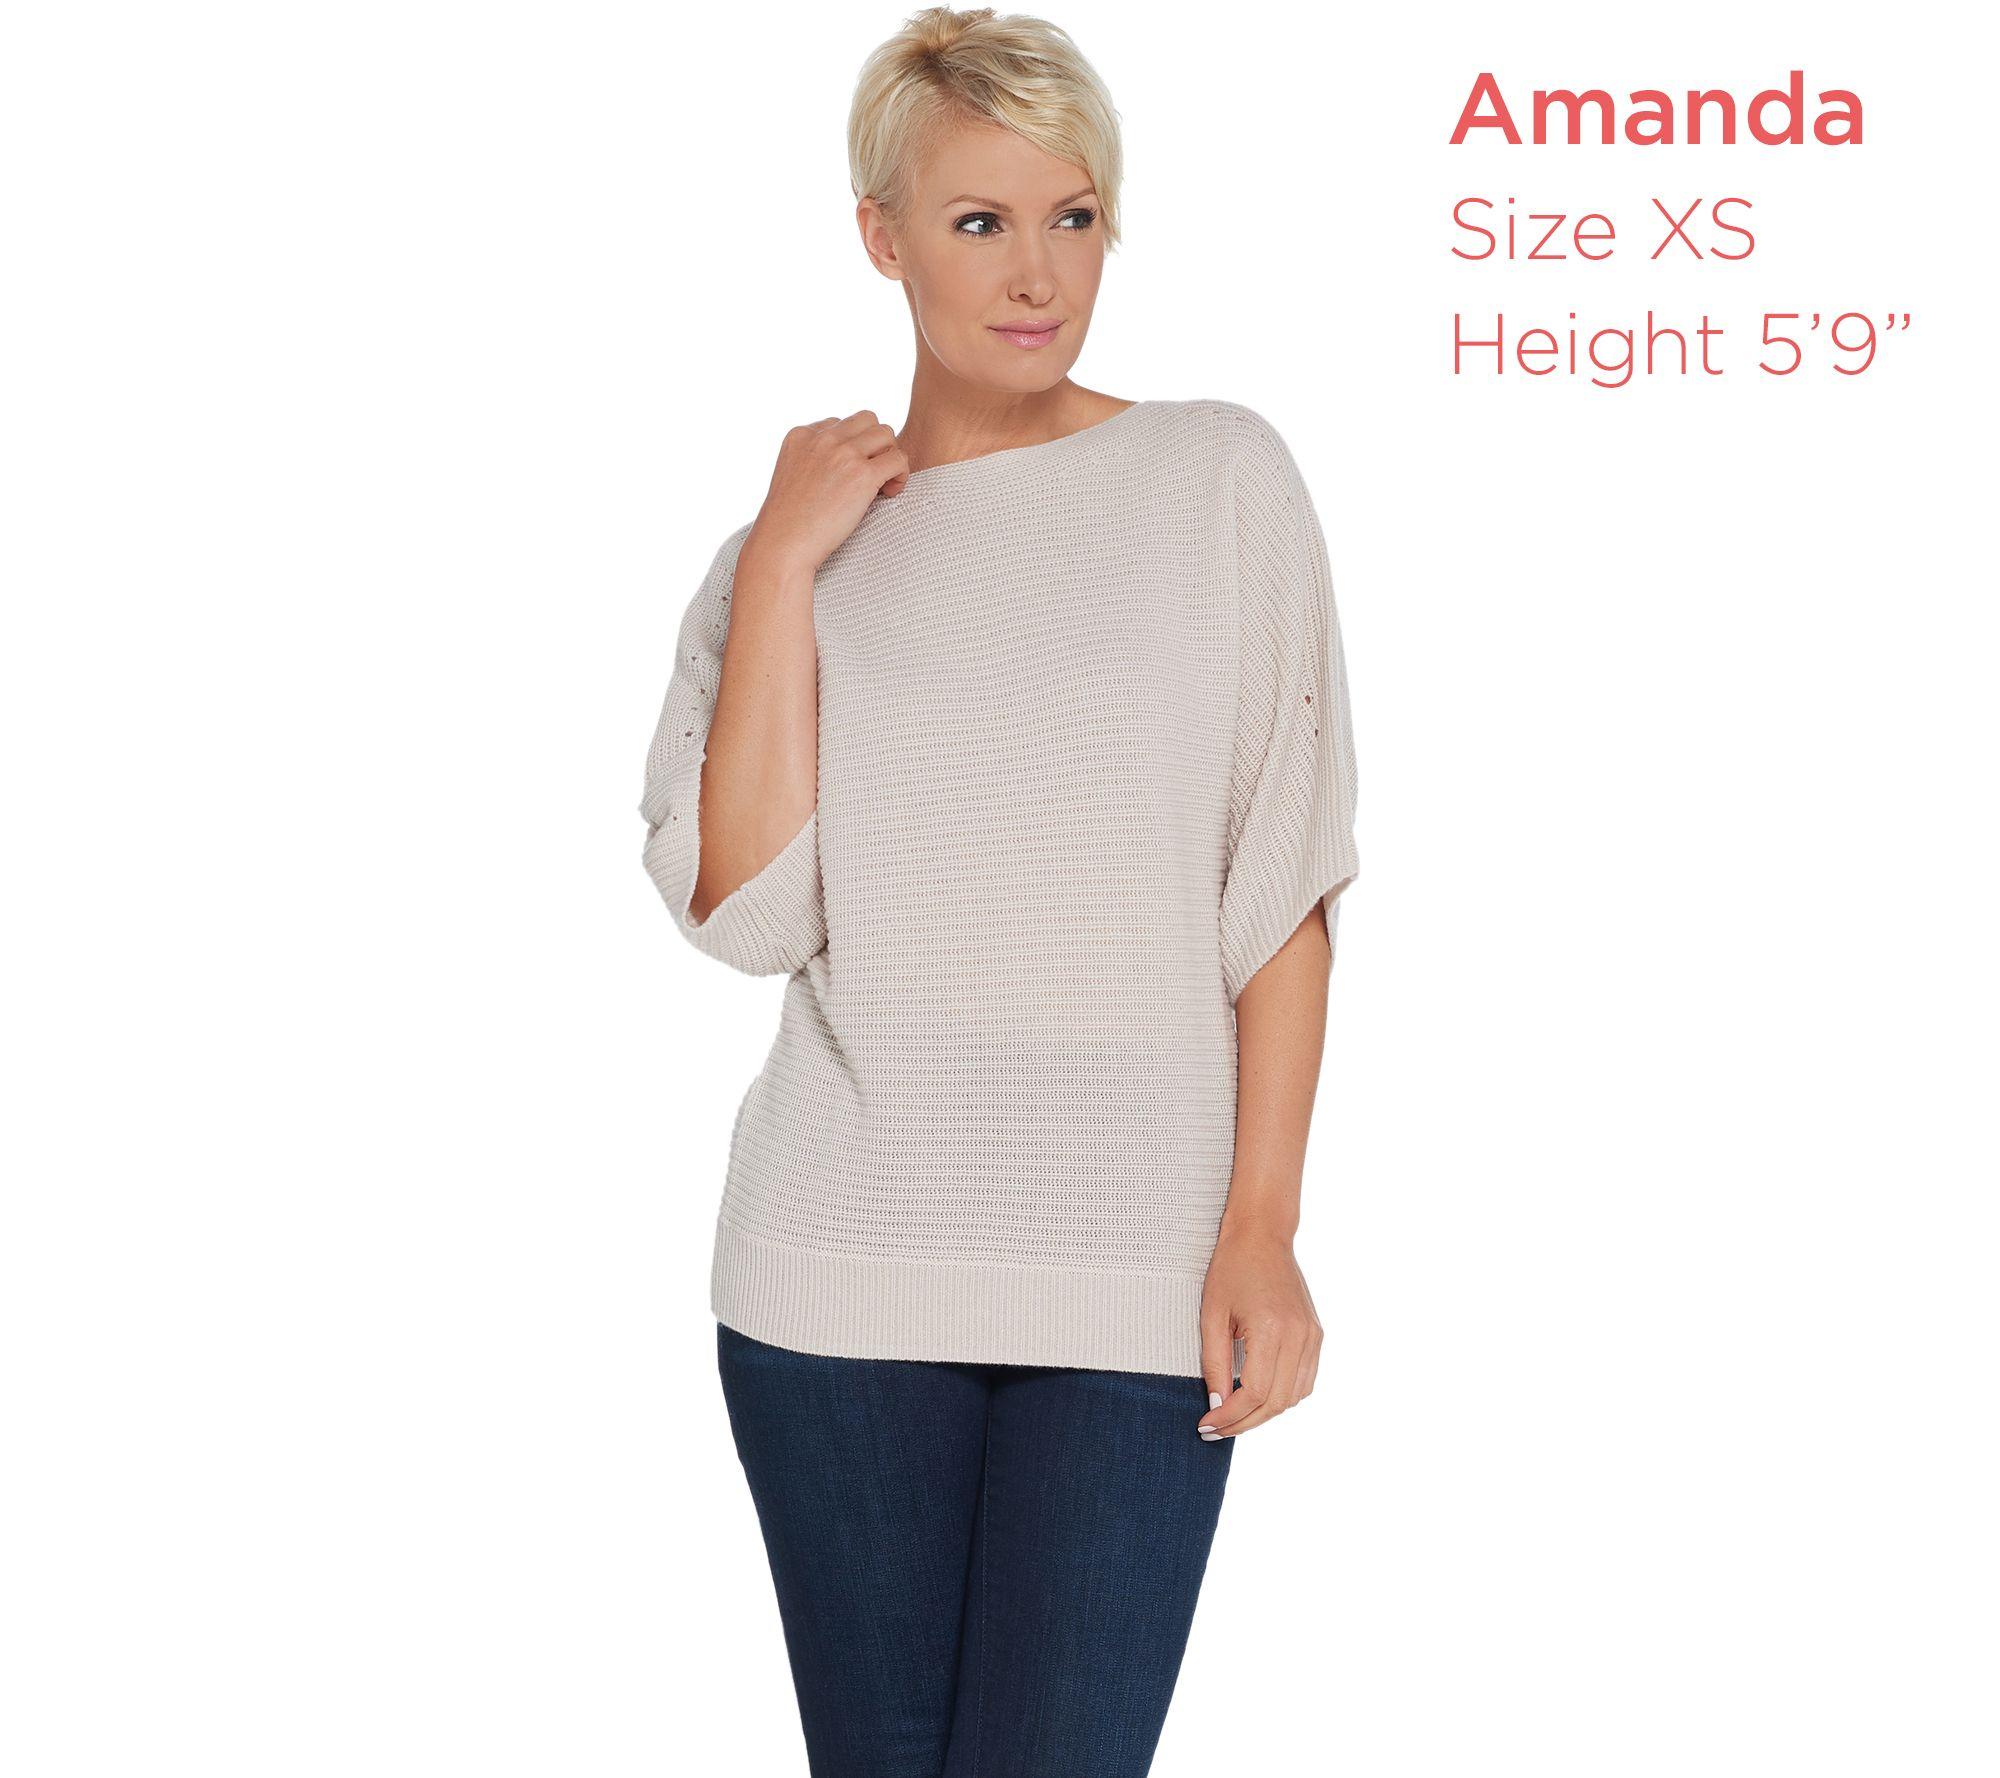 005a2710ea9b6 Martha Stewart Wool Cashmere Dolman Elbow Sleeve Sweater - Page 1 ...